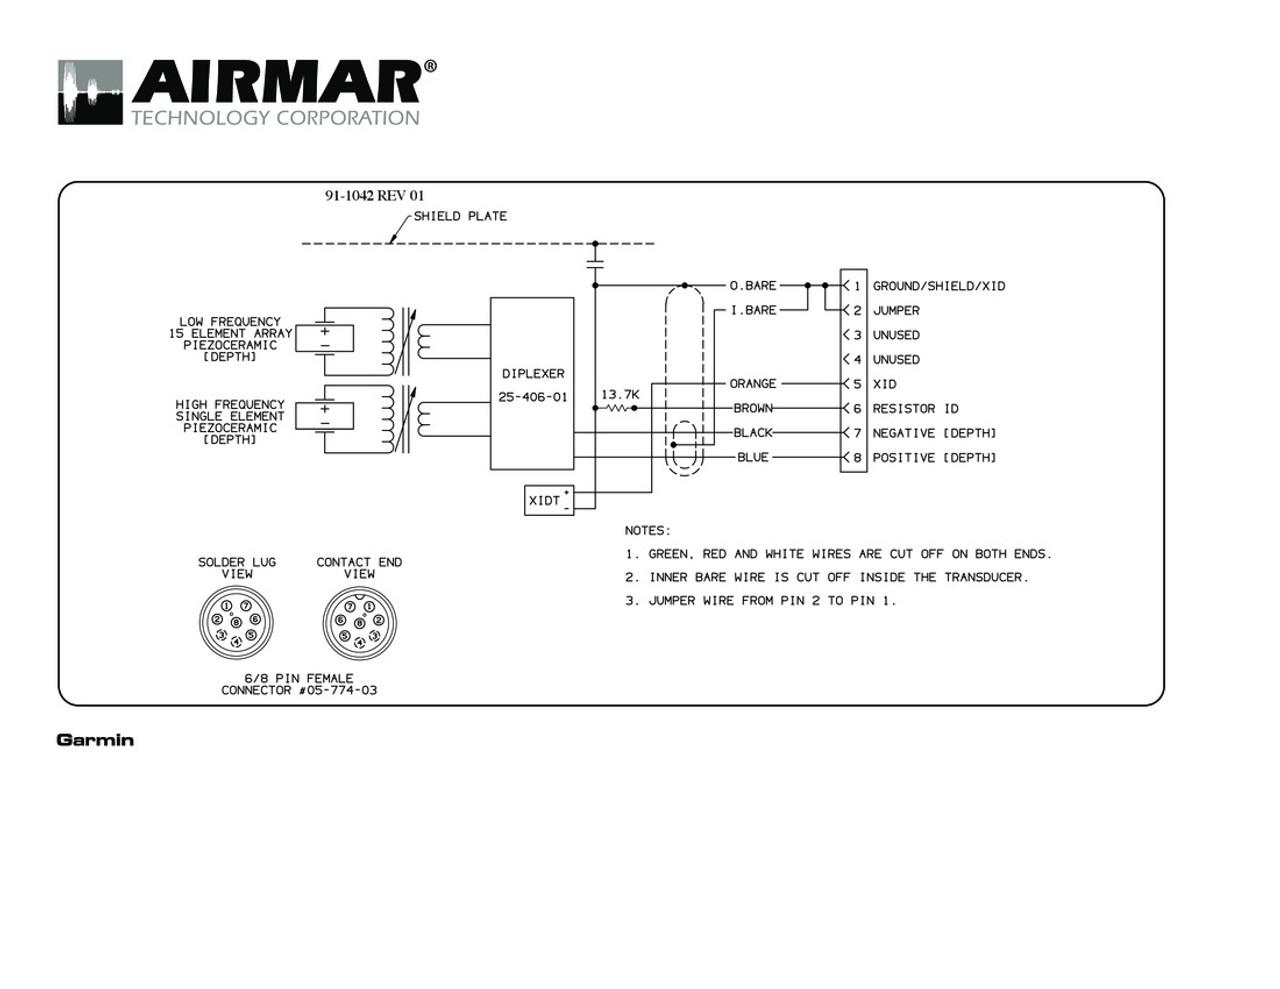 hight resolution of 18 5 wiring diagram garmin wiring diagram g9 channel master wiring diagram 18 5 wiring diagram